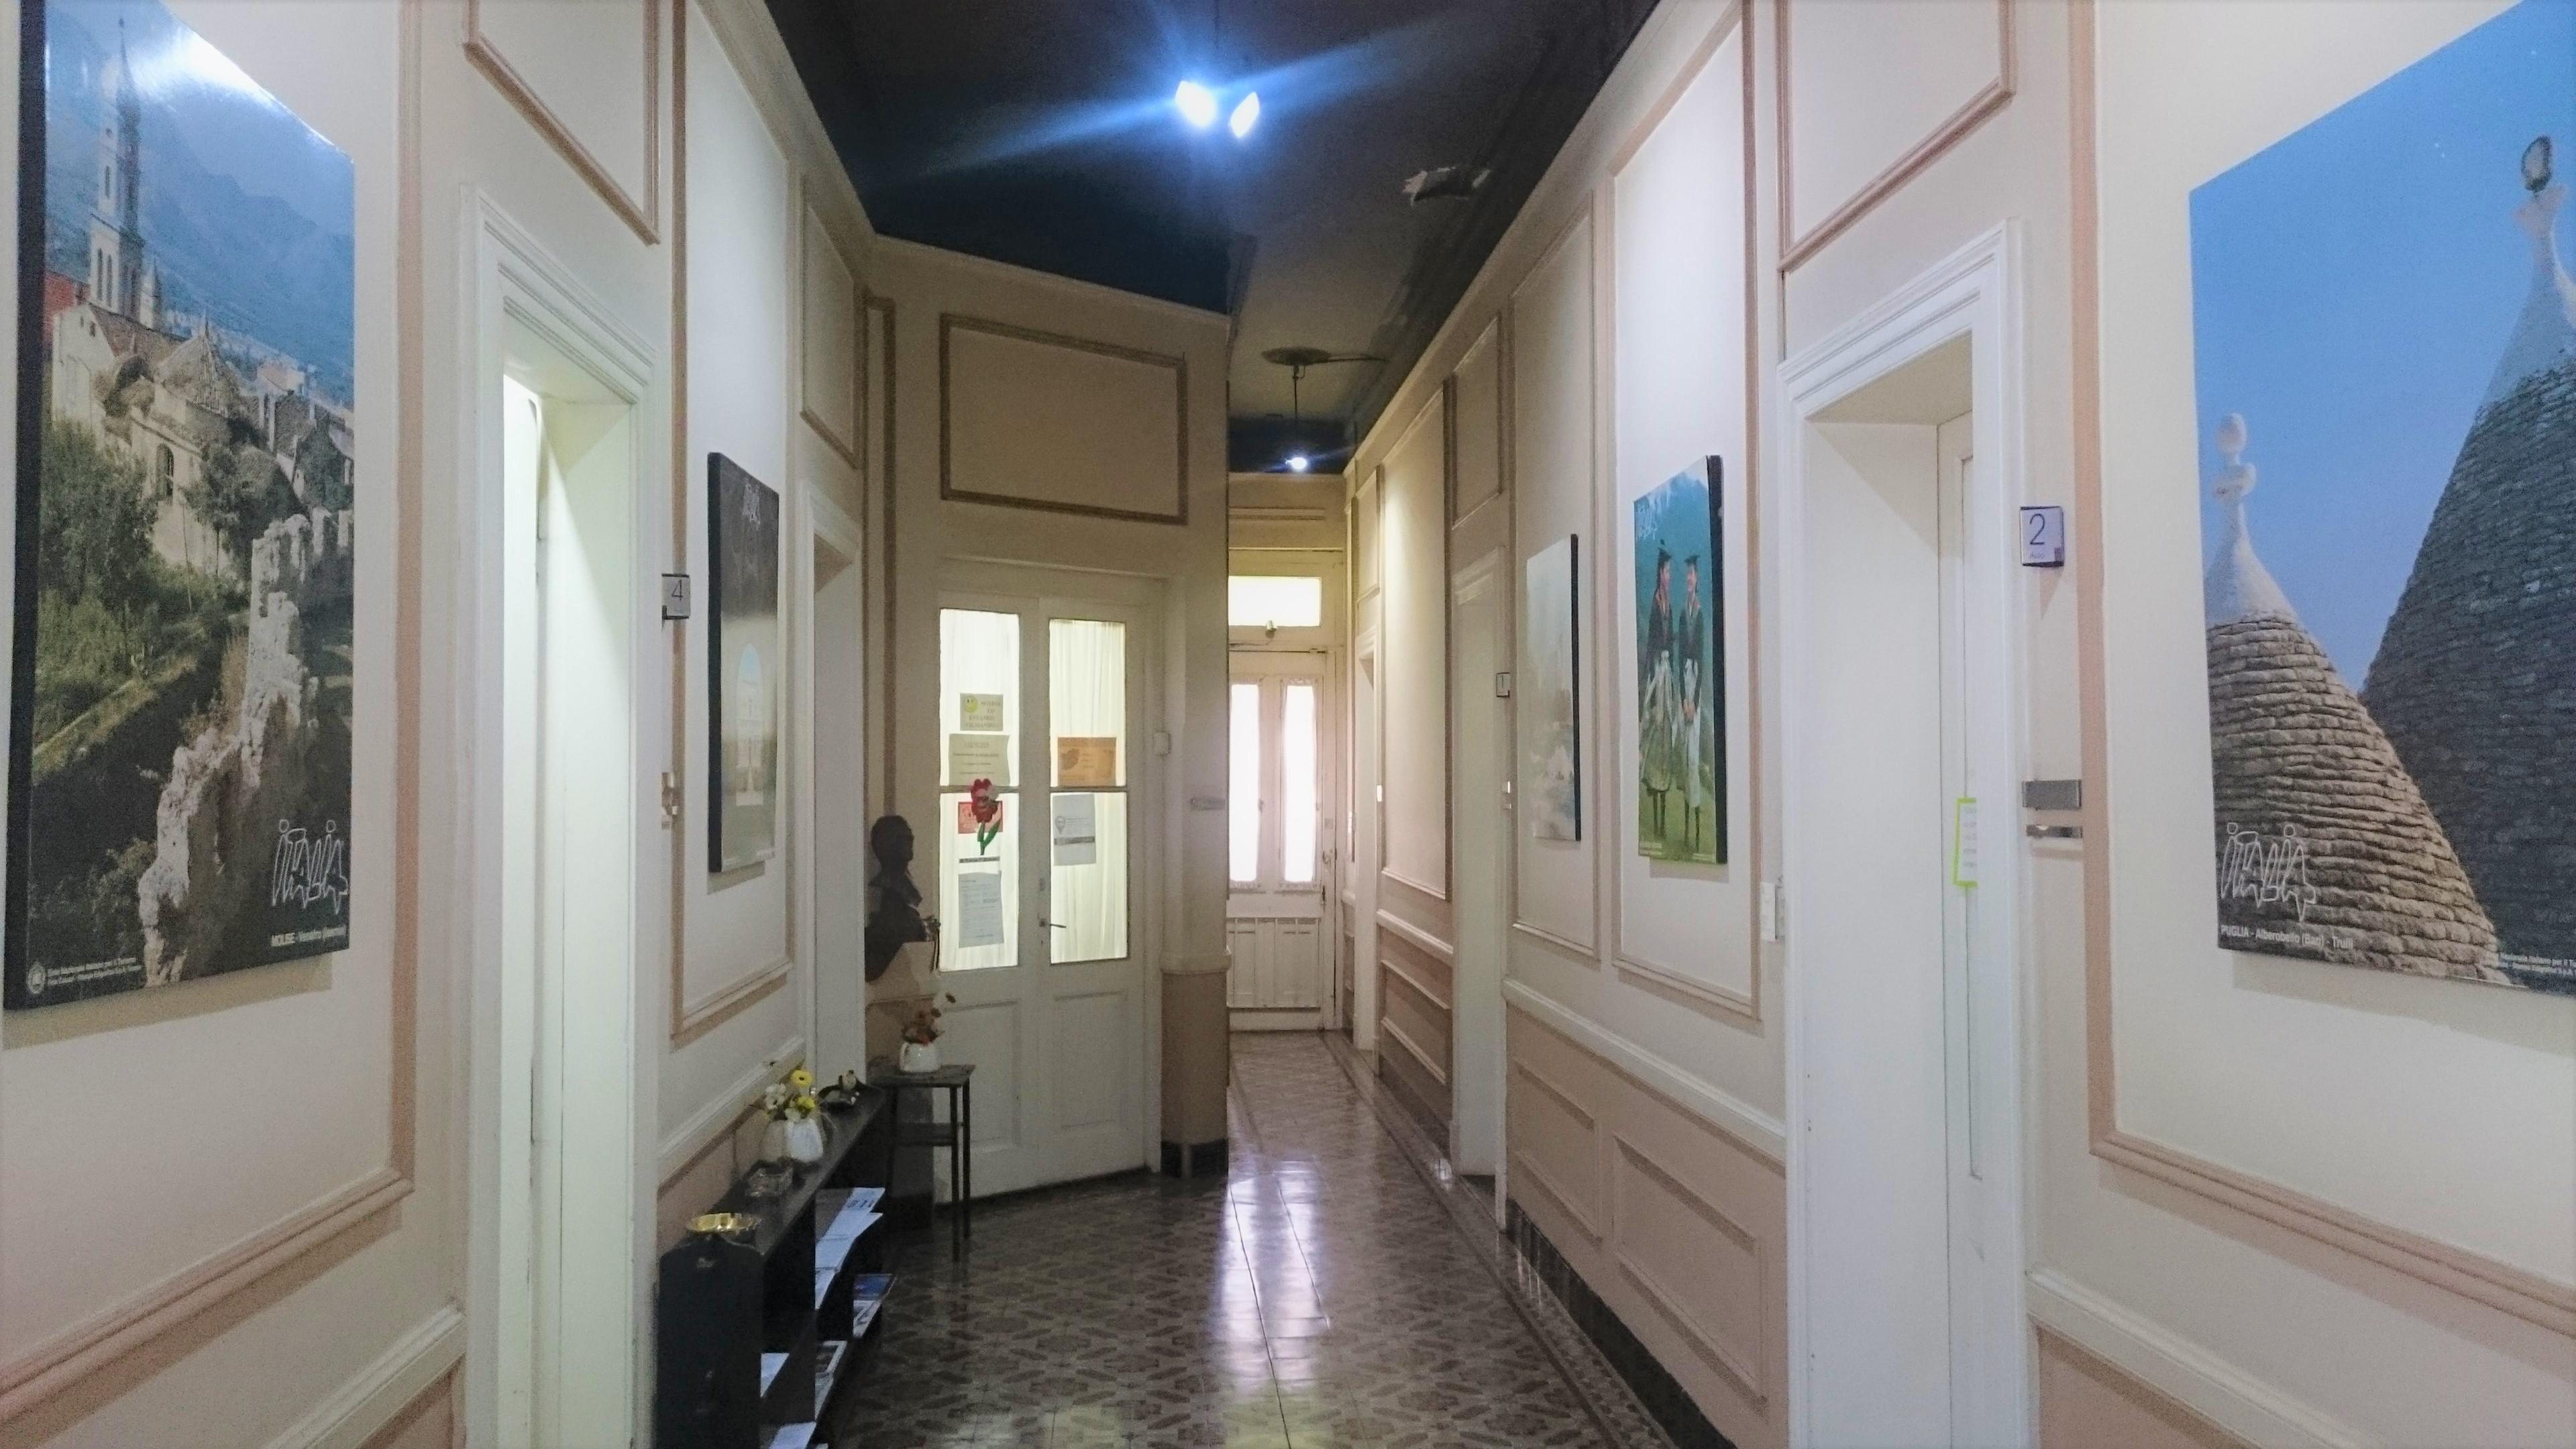 Interior De La Dante Alighieri